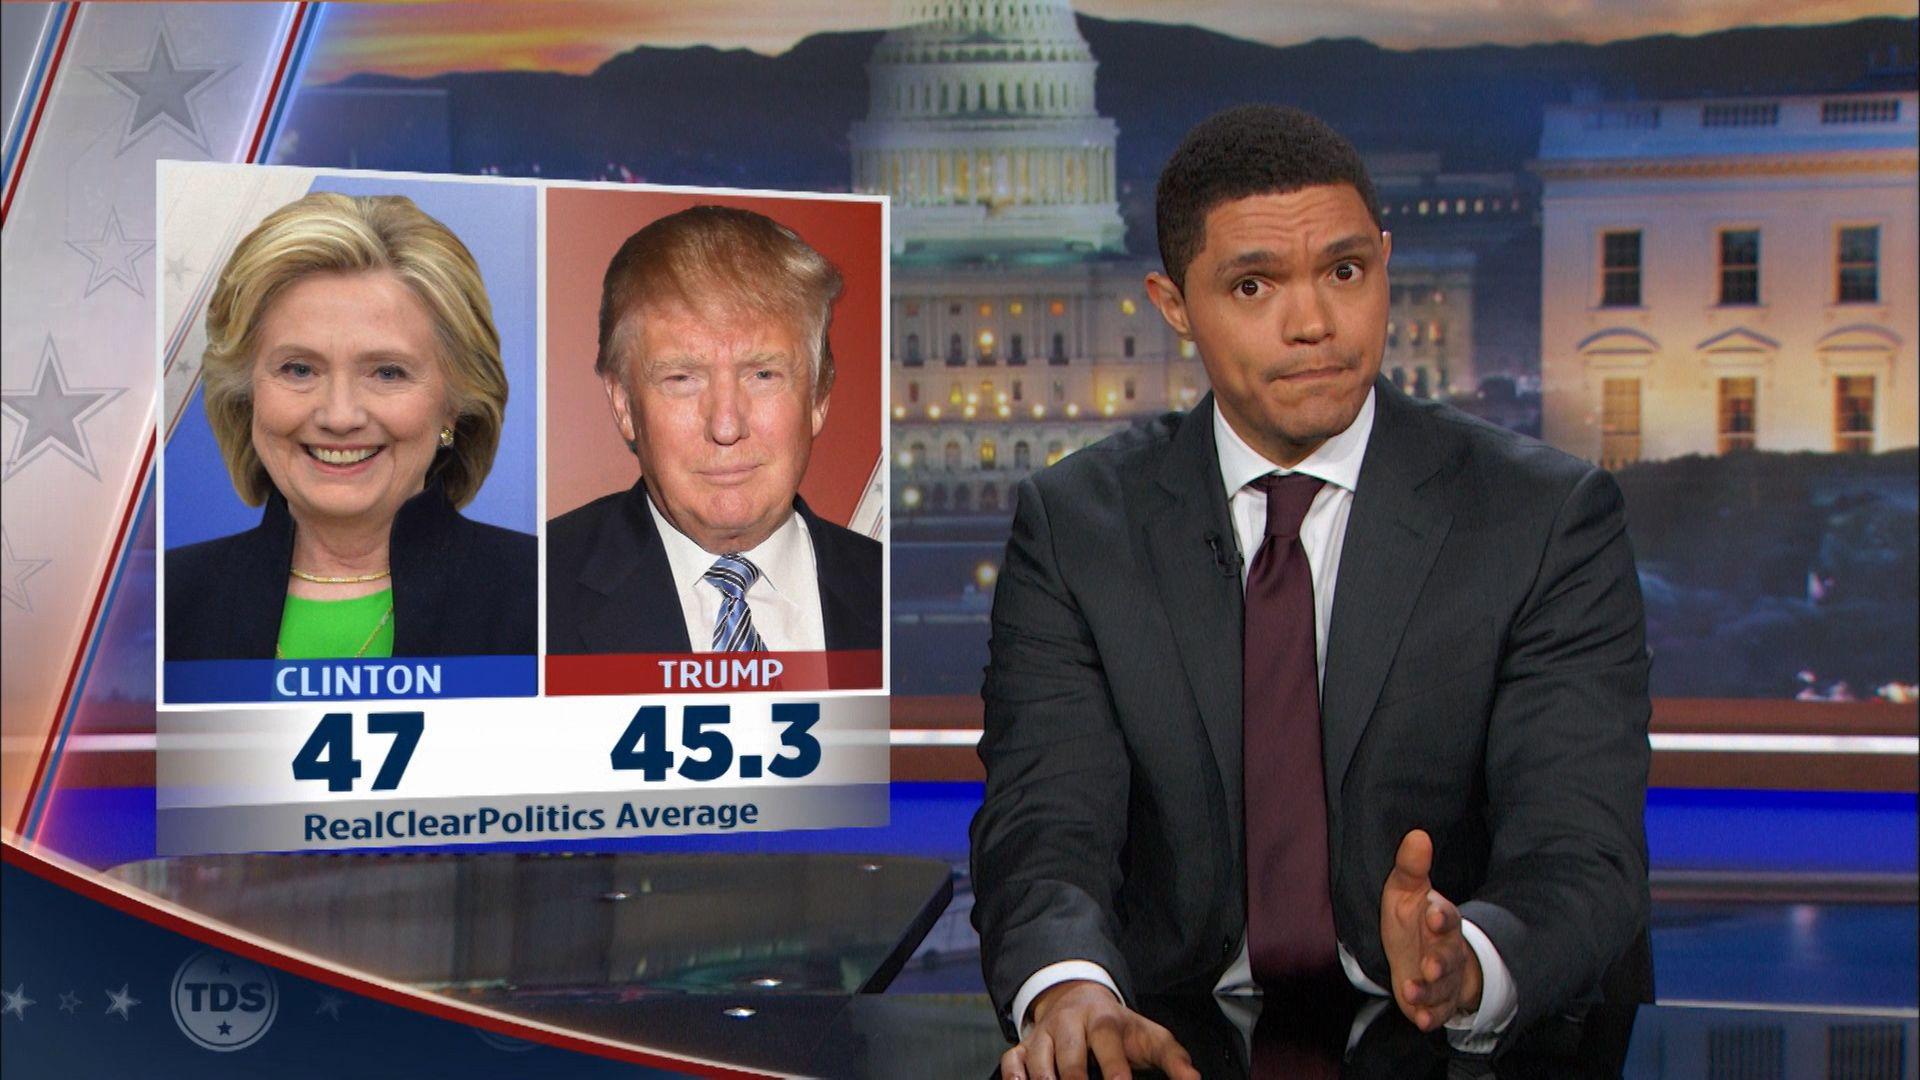 The Daily Show with Trevor Noah - November 2, 2016 - Kal Penn - Full  Episode | Comedy Central